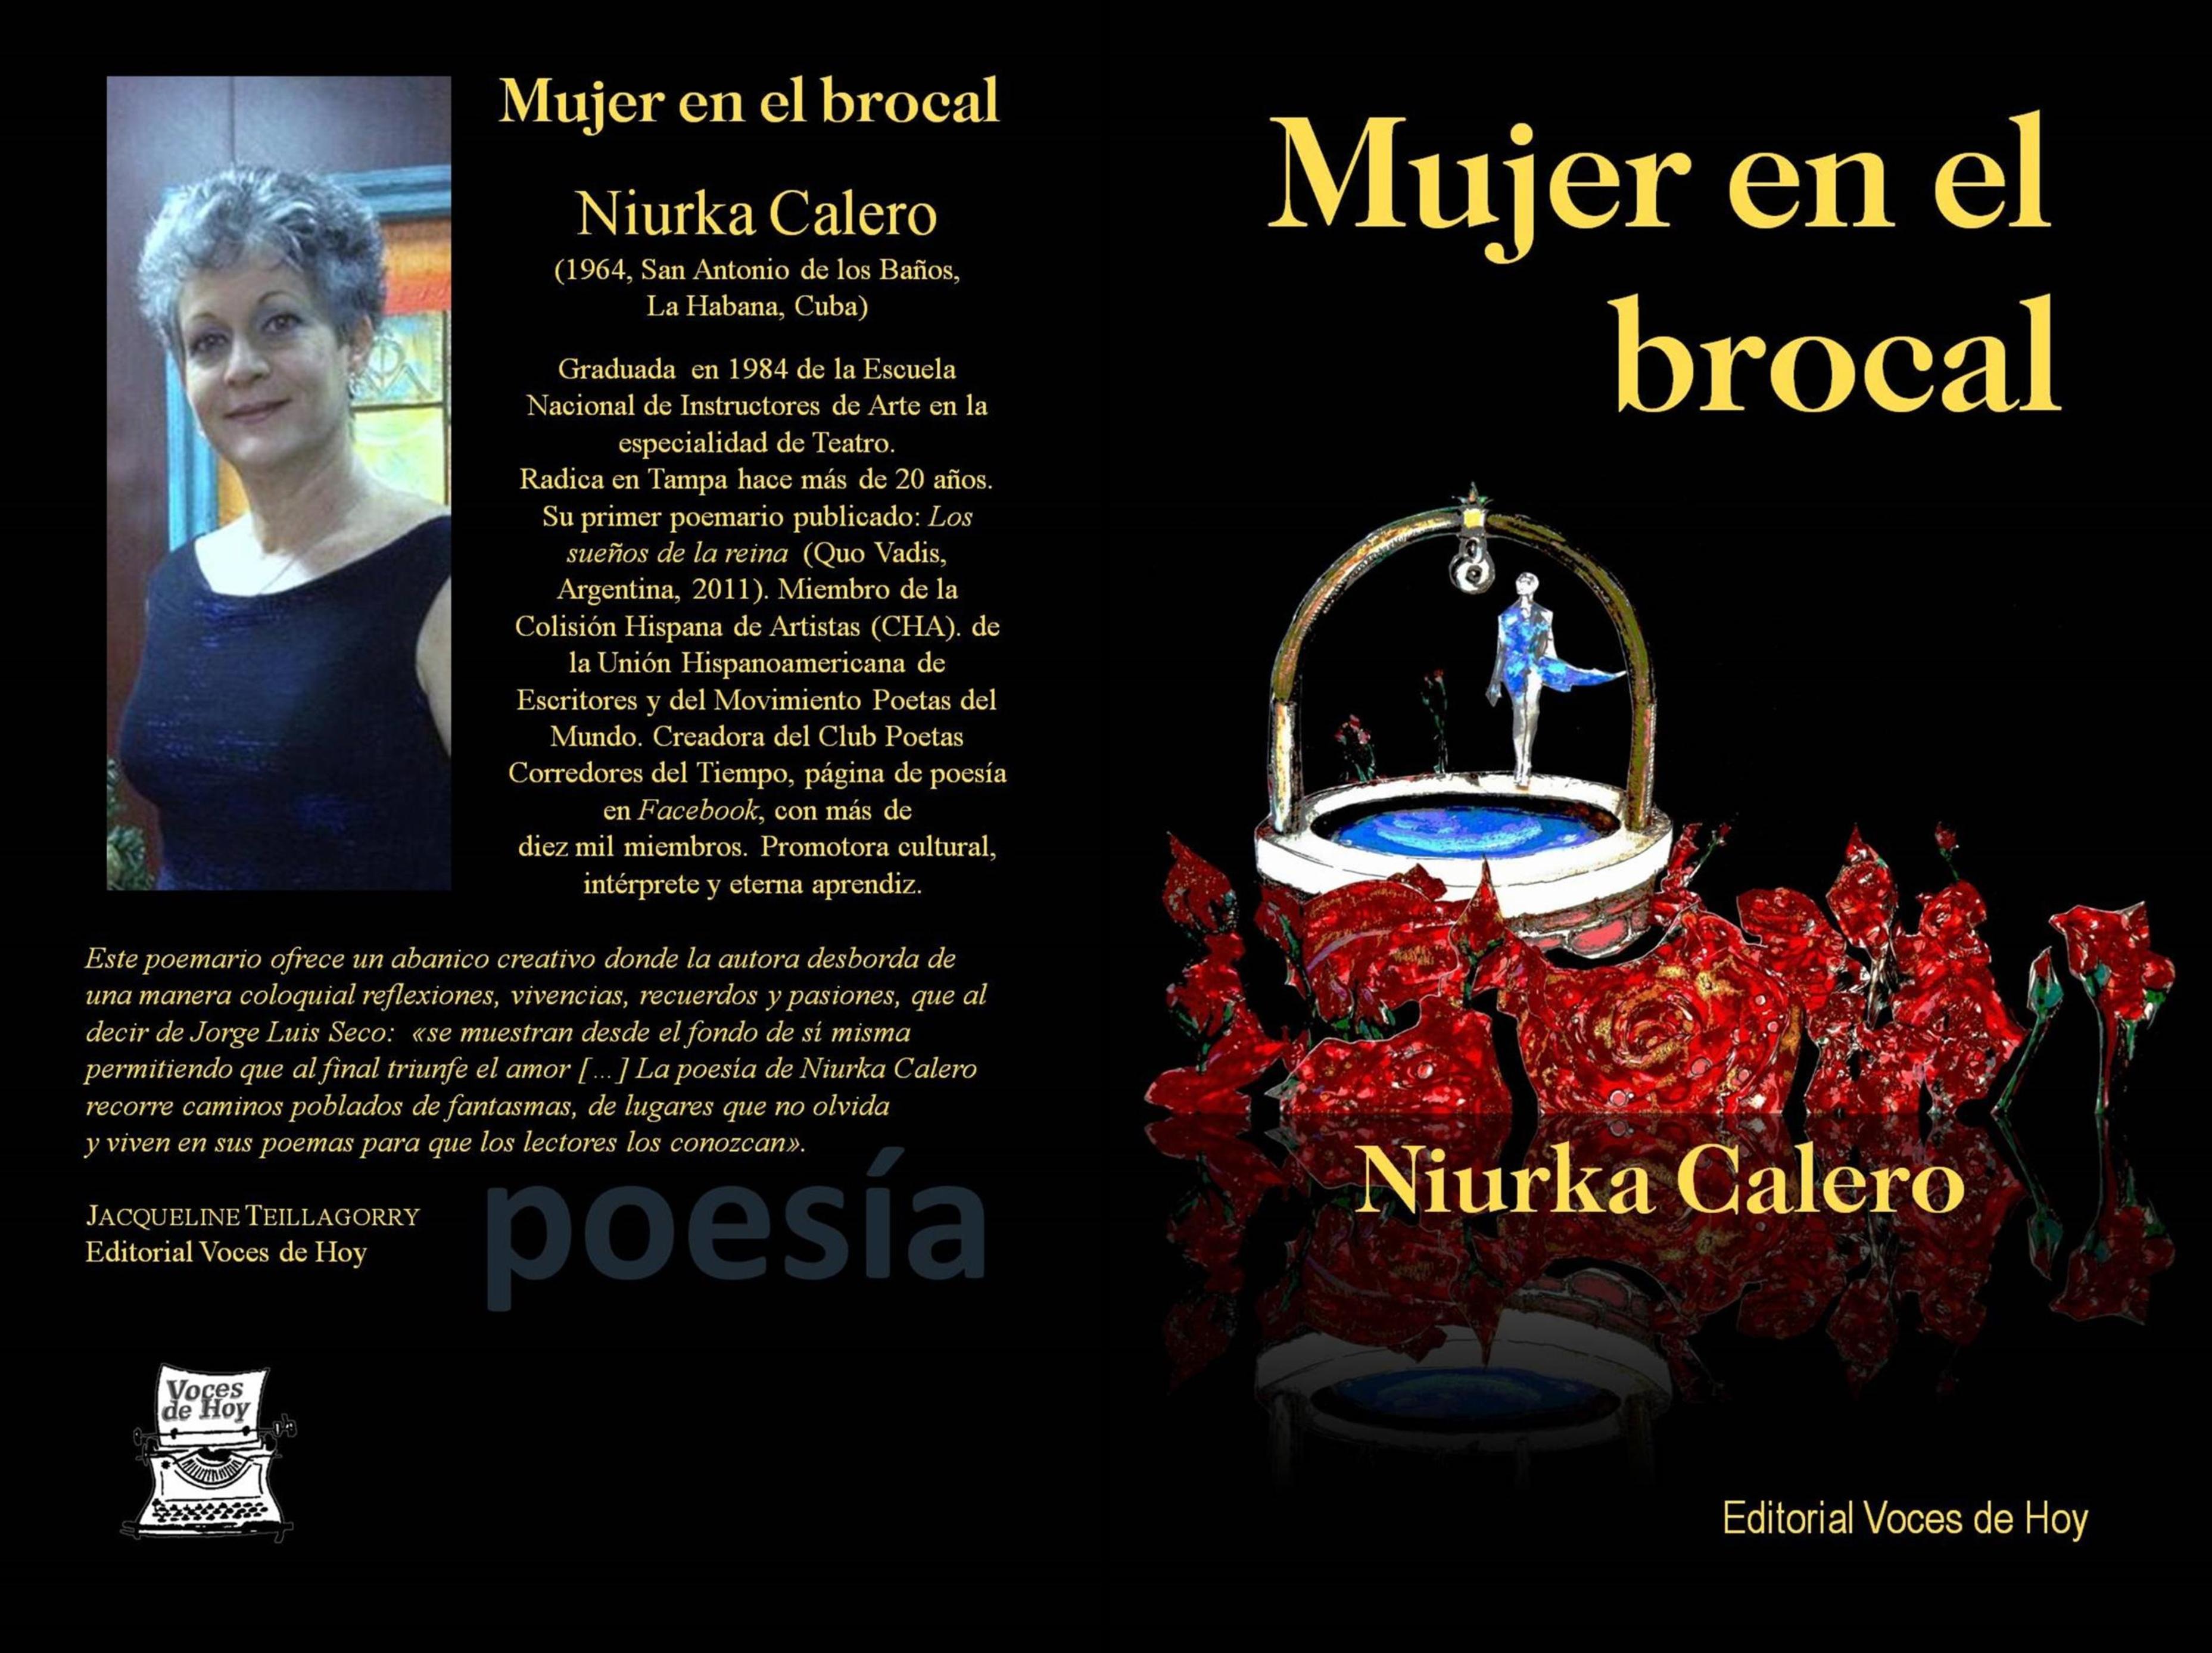 Niurka Calero